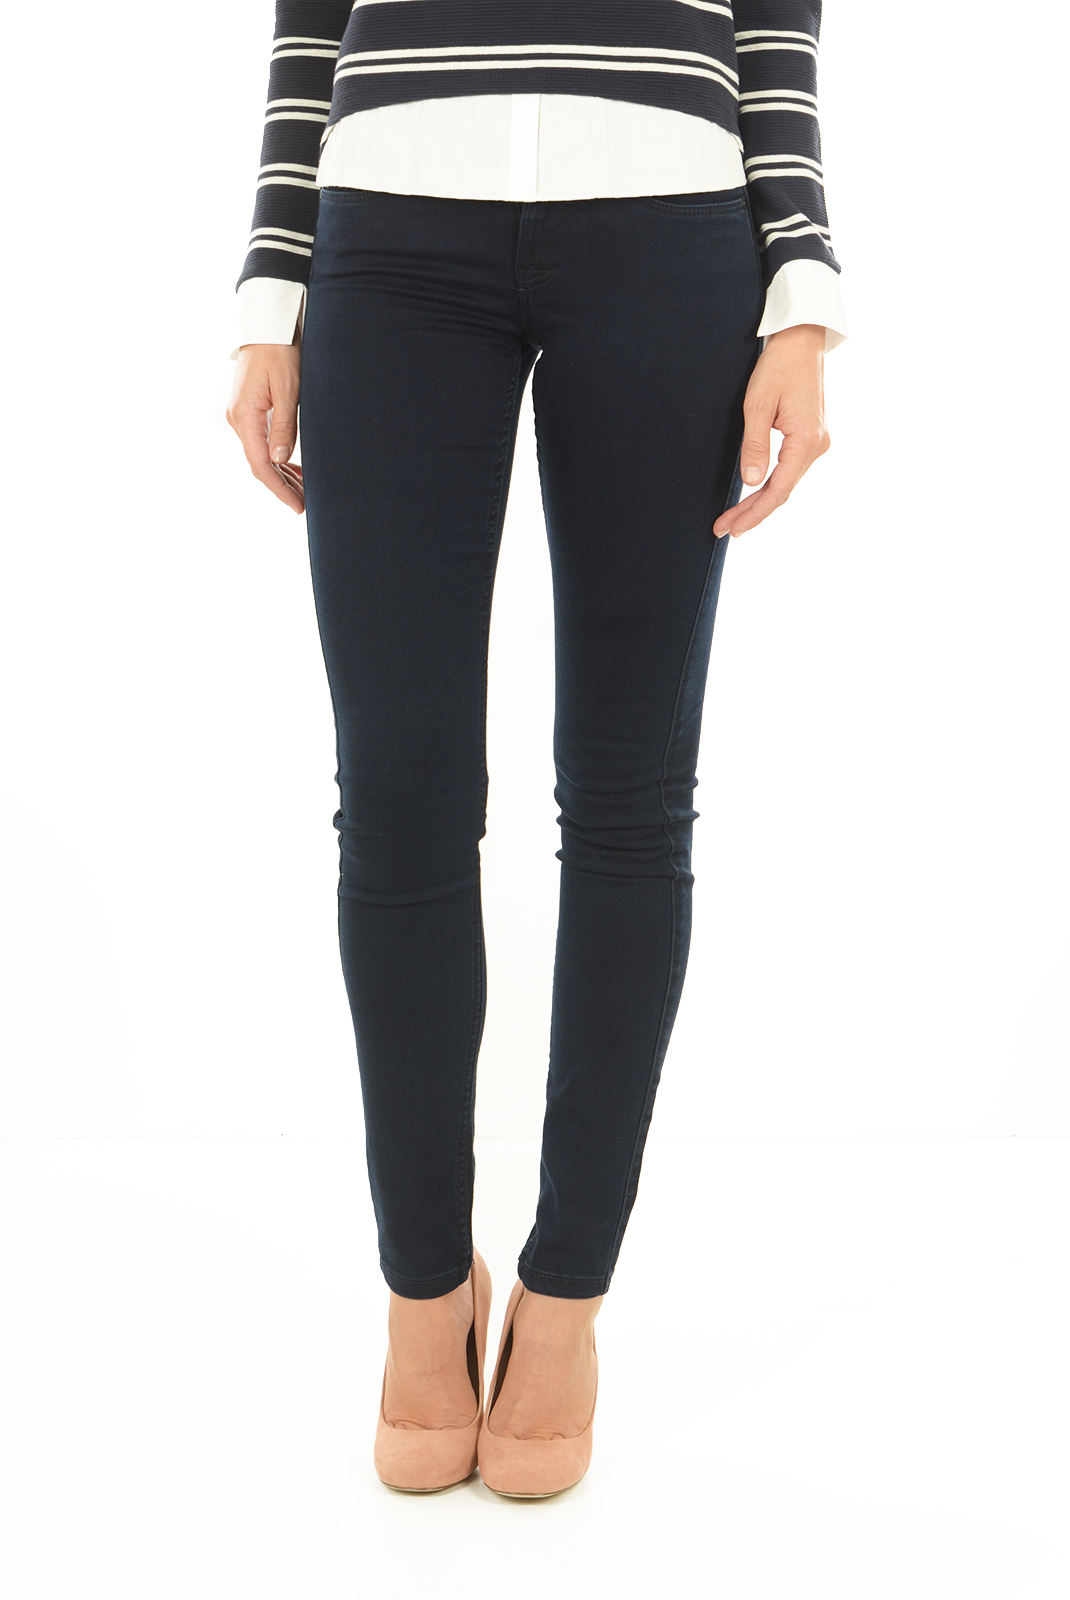 Jeans slim  Only SKINNY REG SOFT PIM205 DK BLUE DENIM